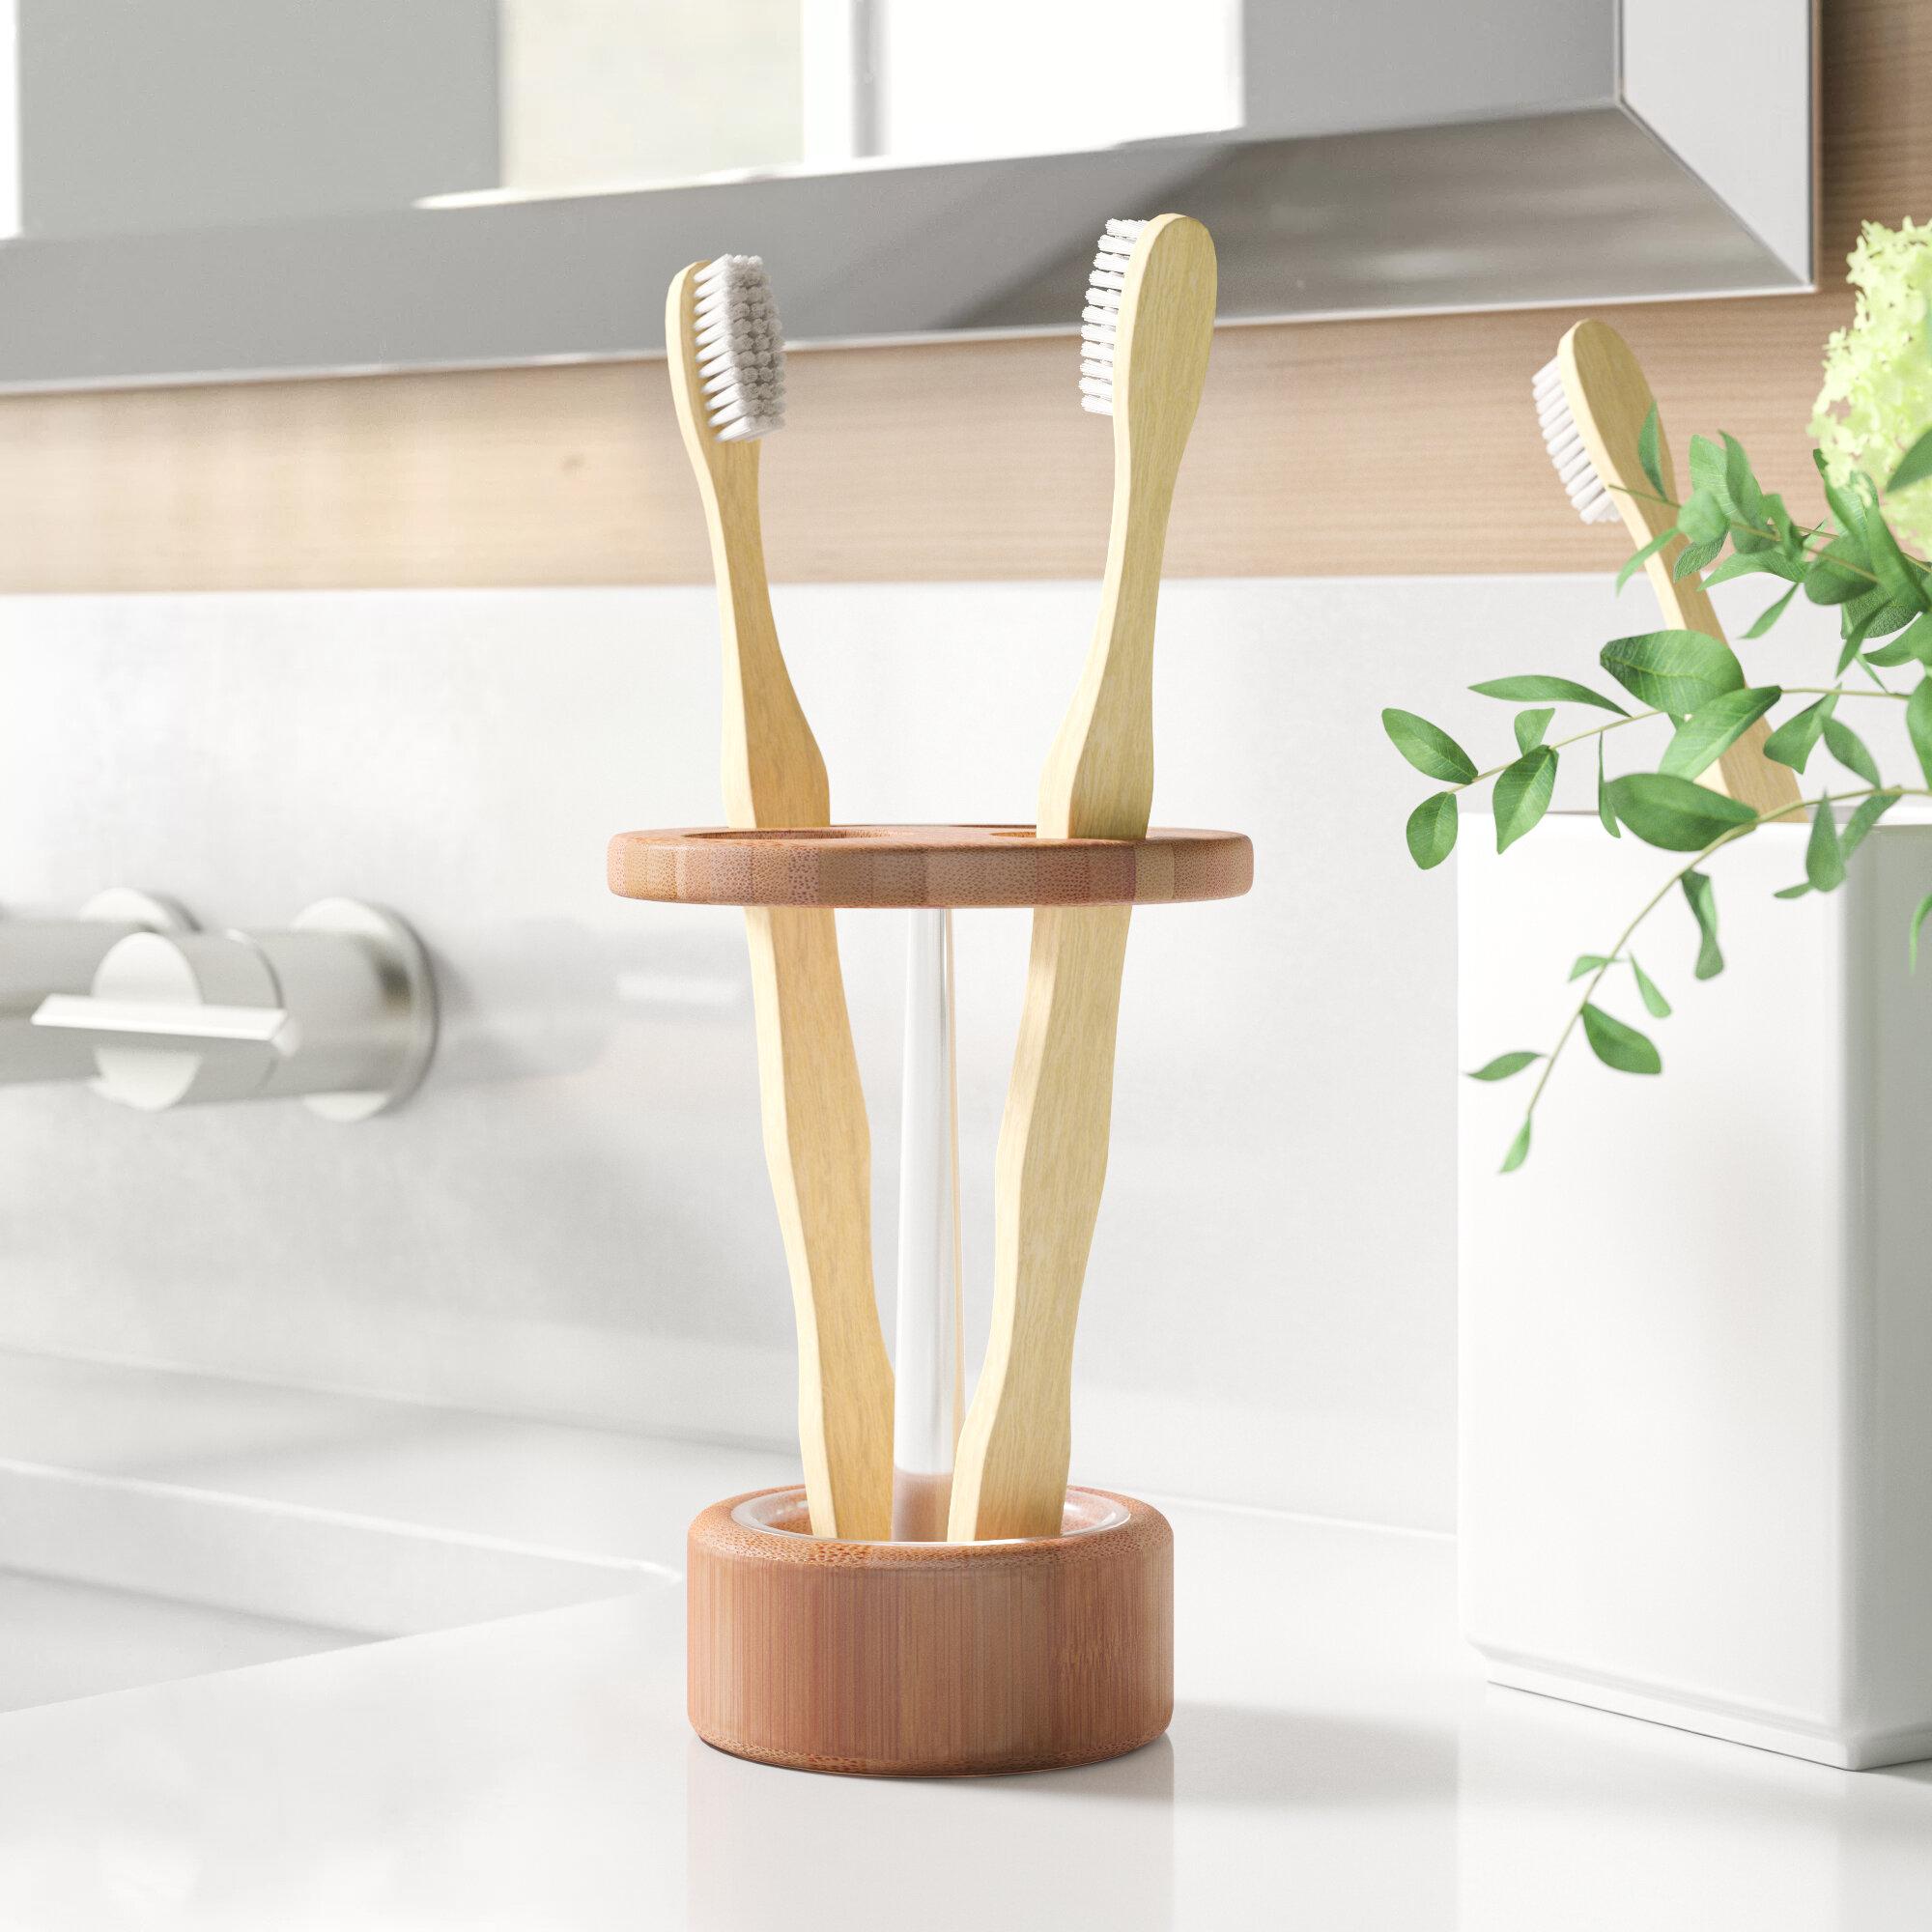 Toothbrush Holder Wood Countertop Bath Accessories You Ll Love In 2021 Wayfair